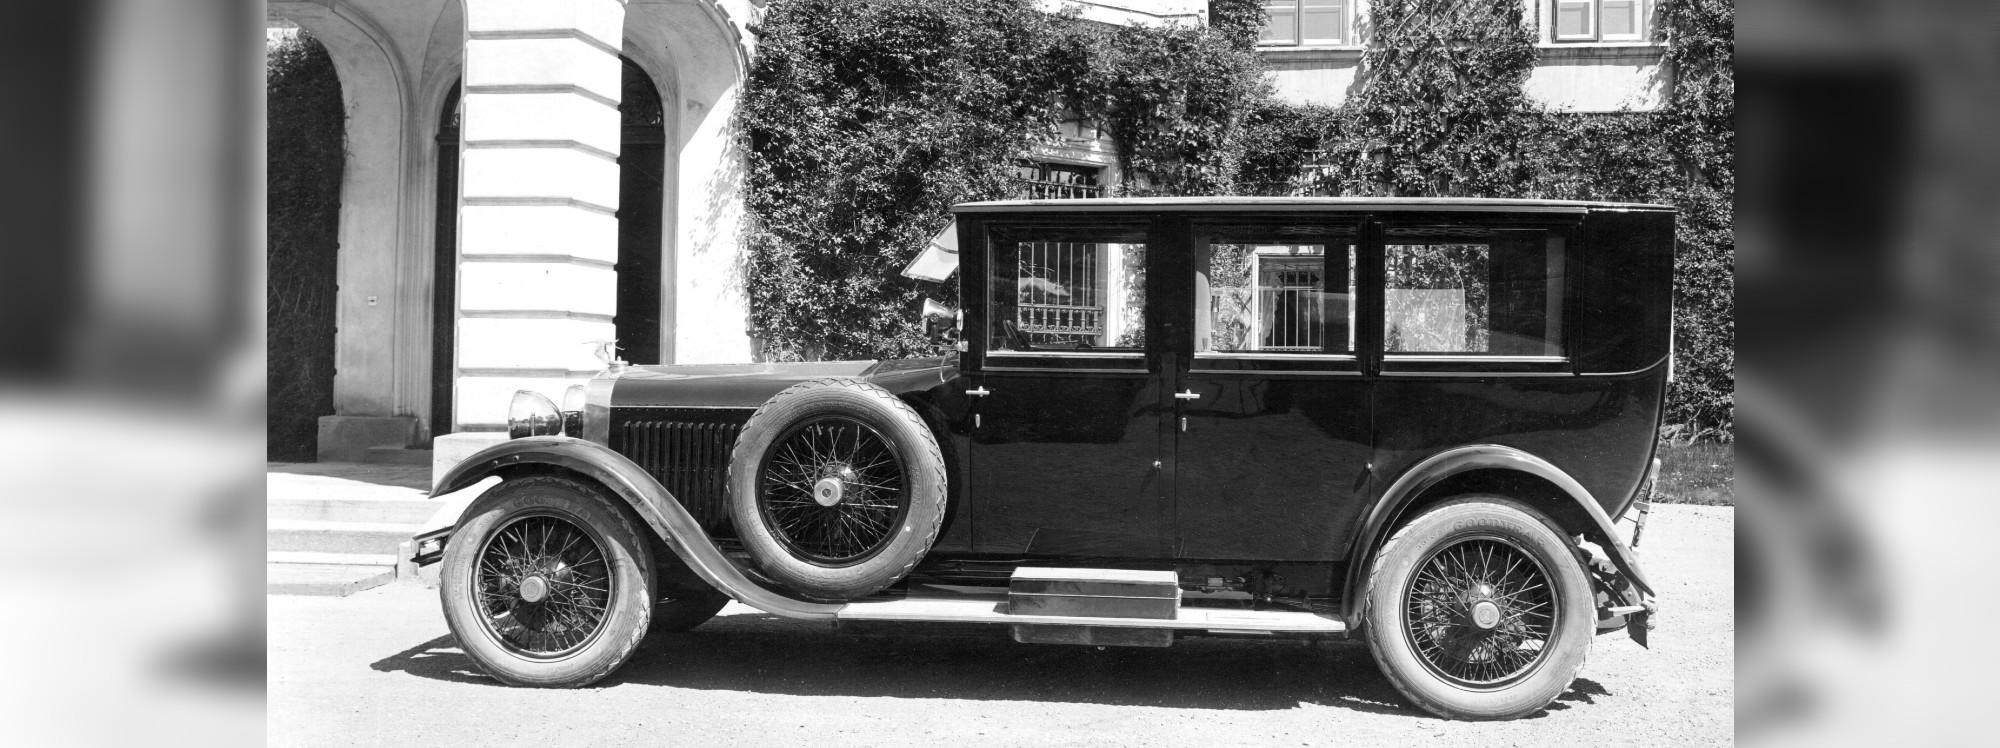 Esta limusina rompió esquemas hace casi un siglo